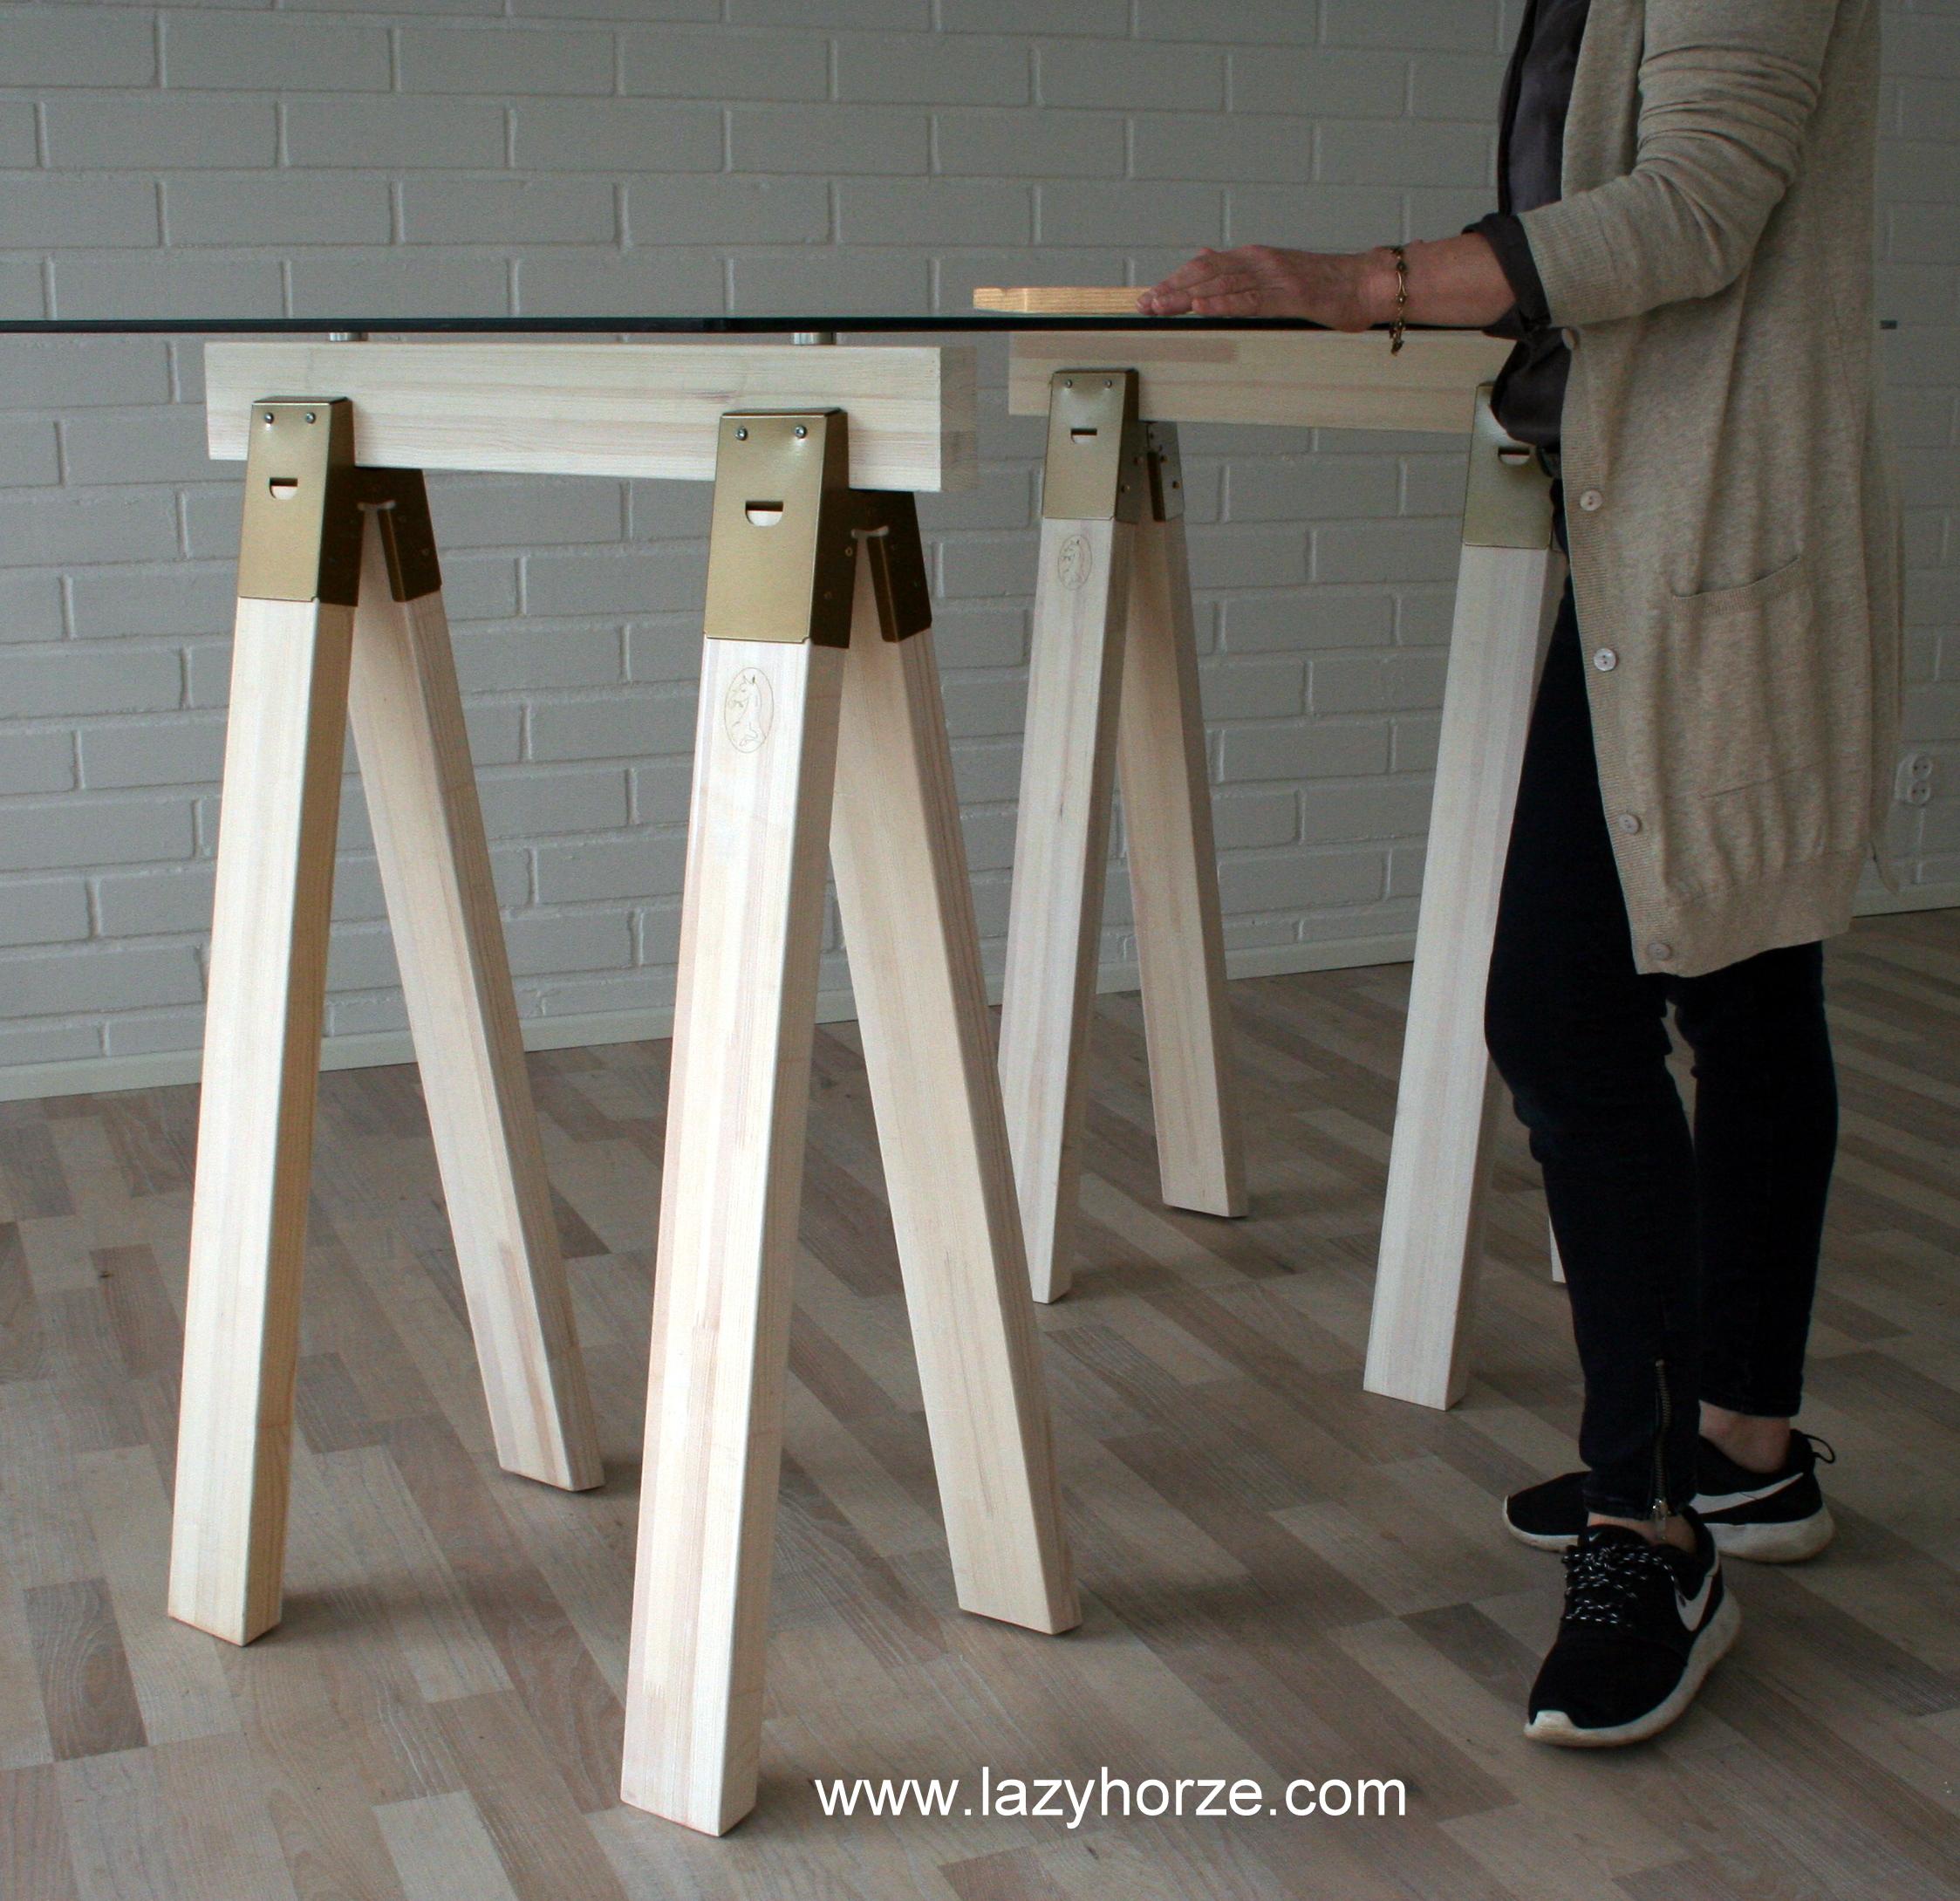 Sawhorse table legs lazyhorze Sawhorse desk legs